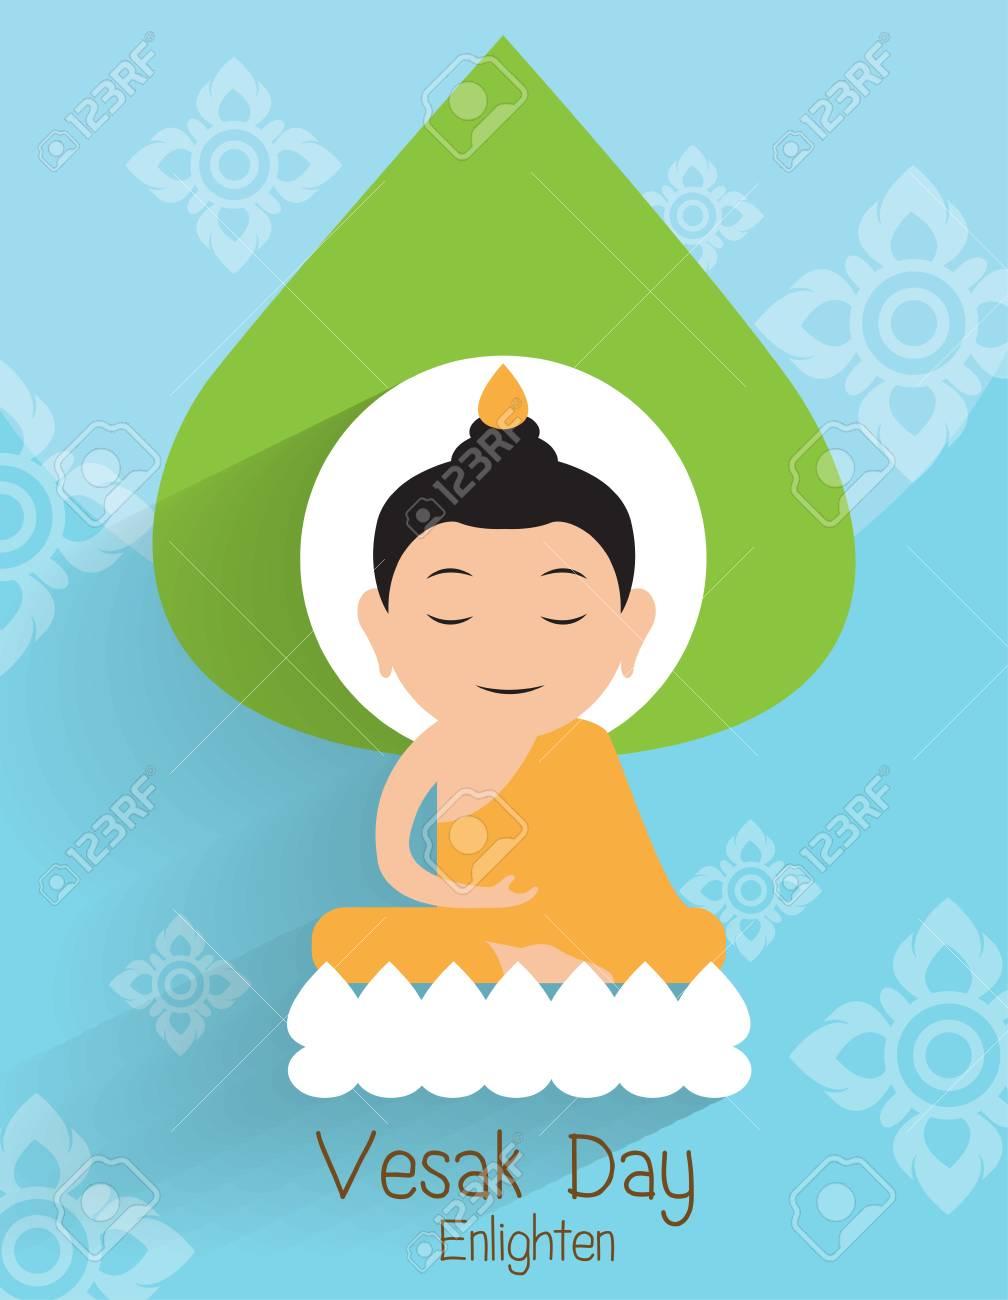 Vesak Day Greeting Card Buddha Enlighten On The Lotus Vector